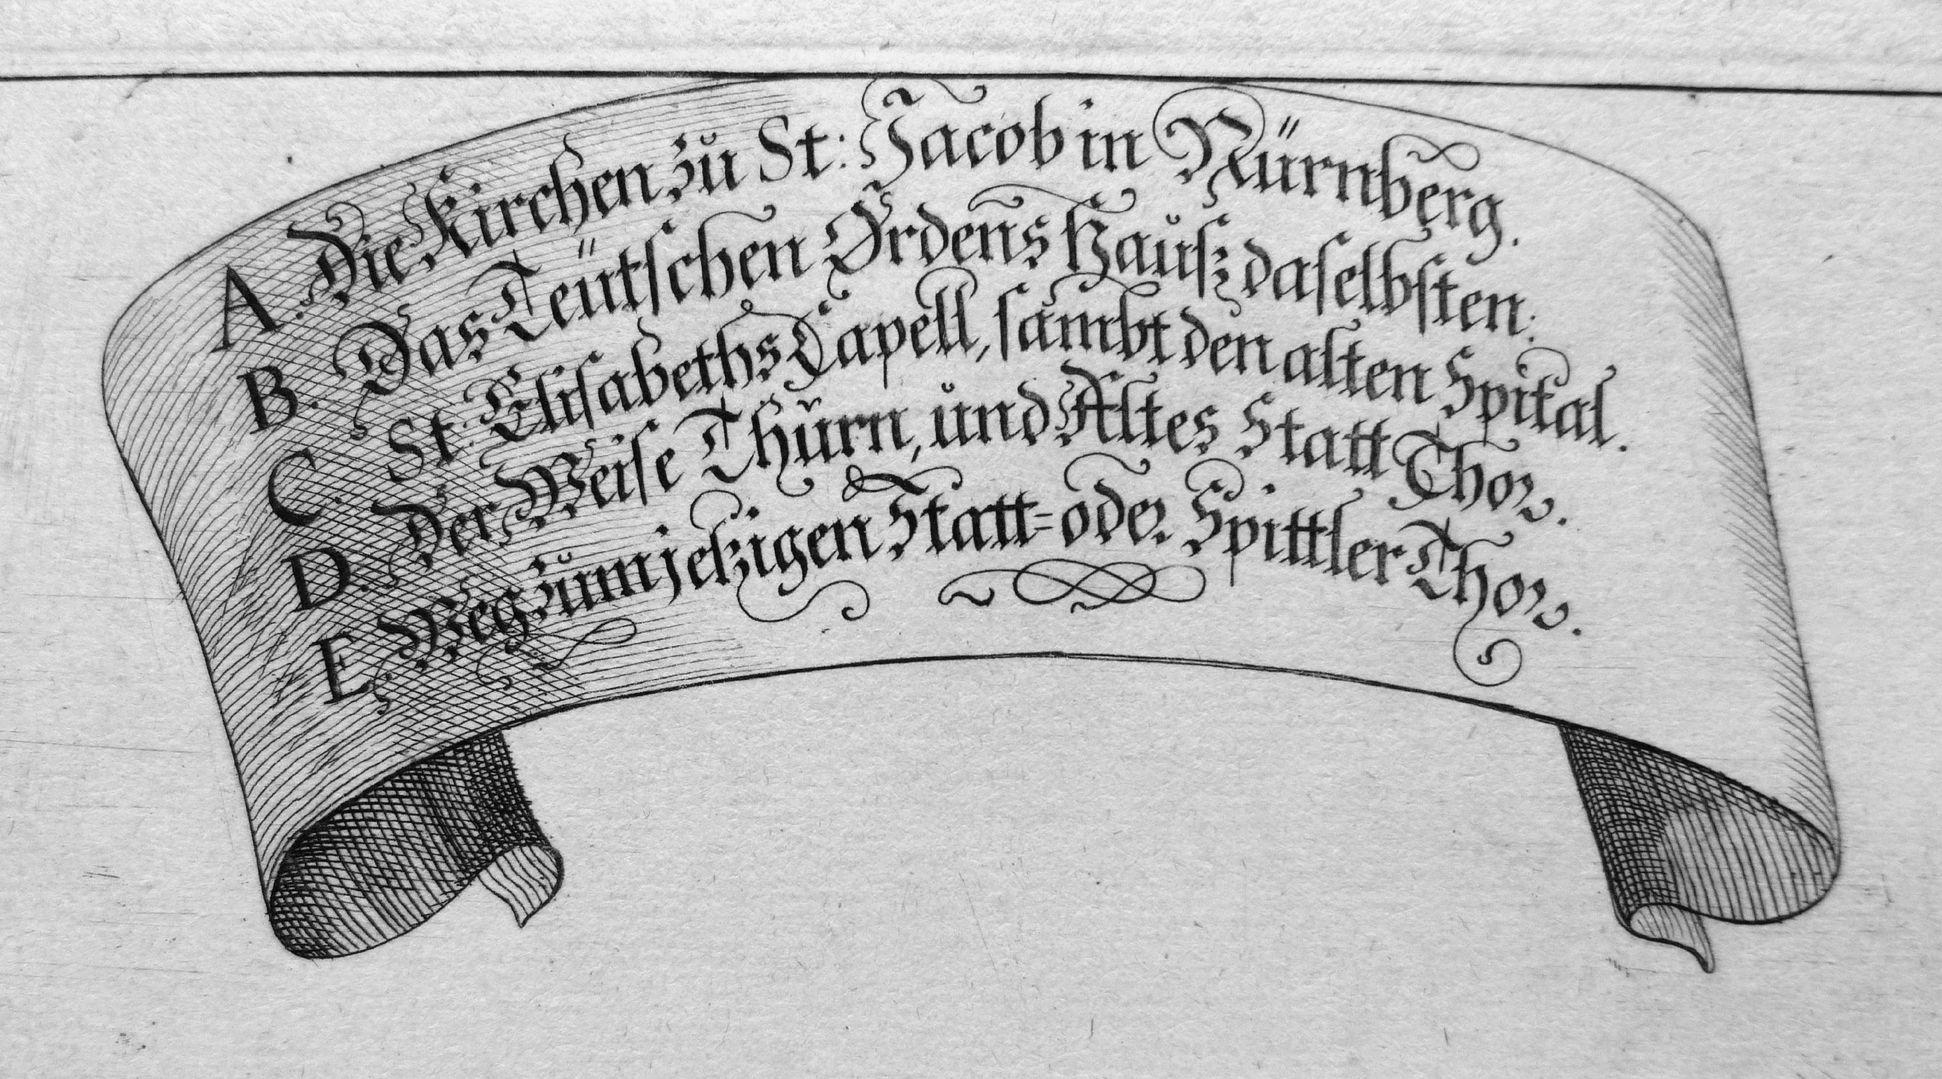 """Urbis Norimbergensis Insigniorum Templorum…"" House of the Teutonic Order and St. Jacob-Church Image legend"